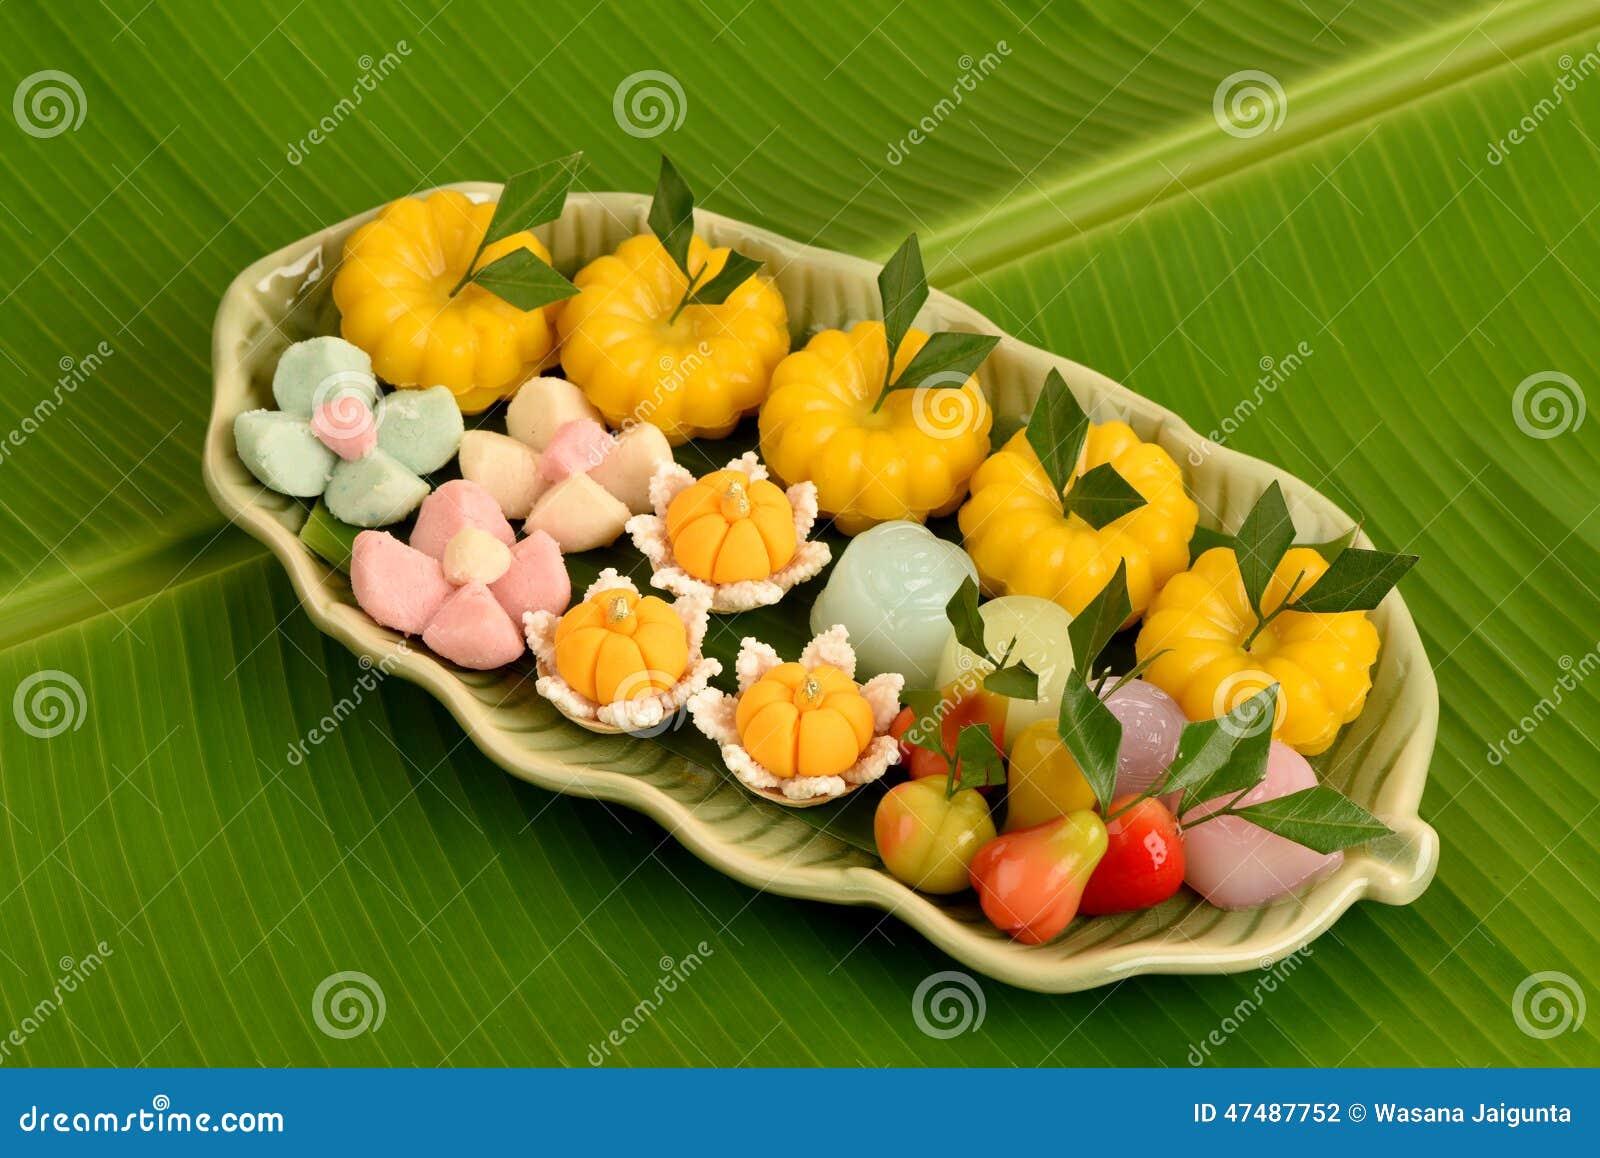 thai dessert on banana leaf green background stock photo. Black Bedroom Furniture Sets. Home Design Ideas